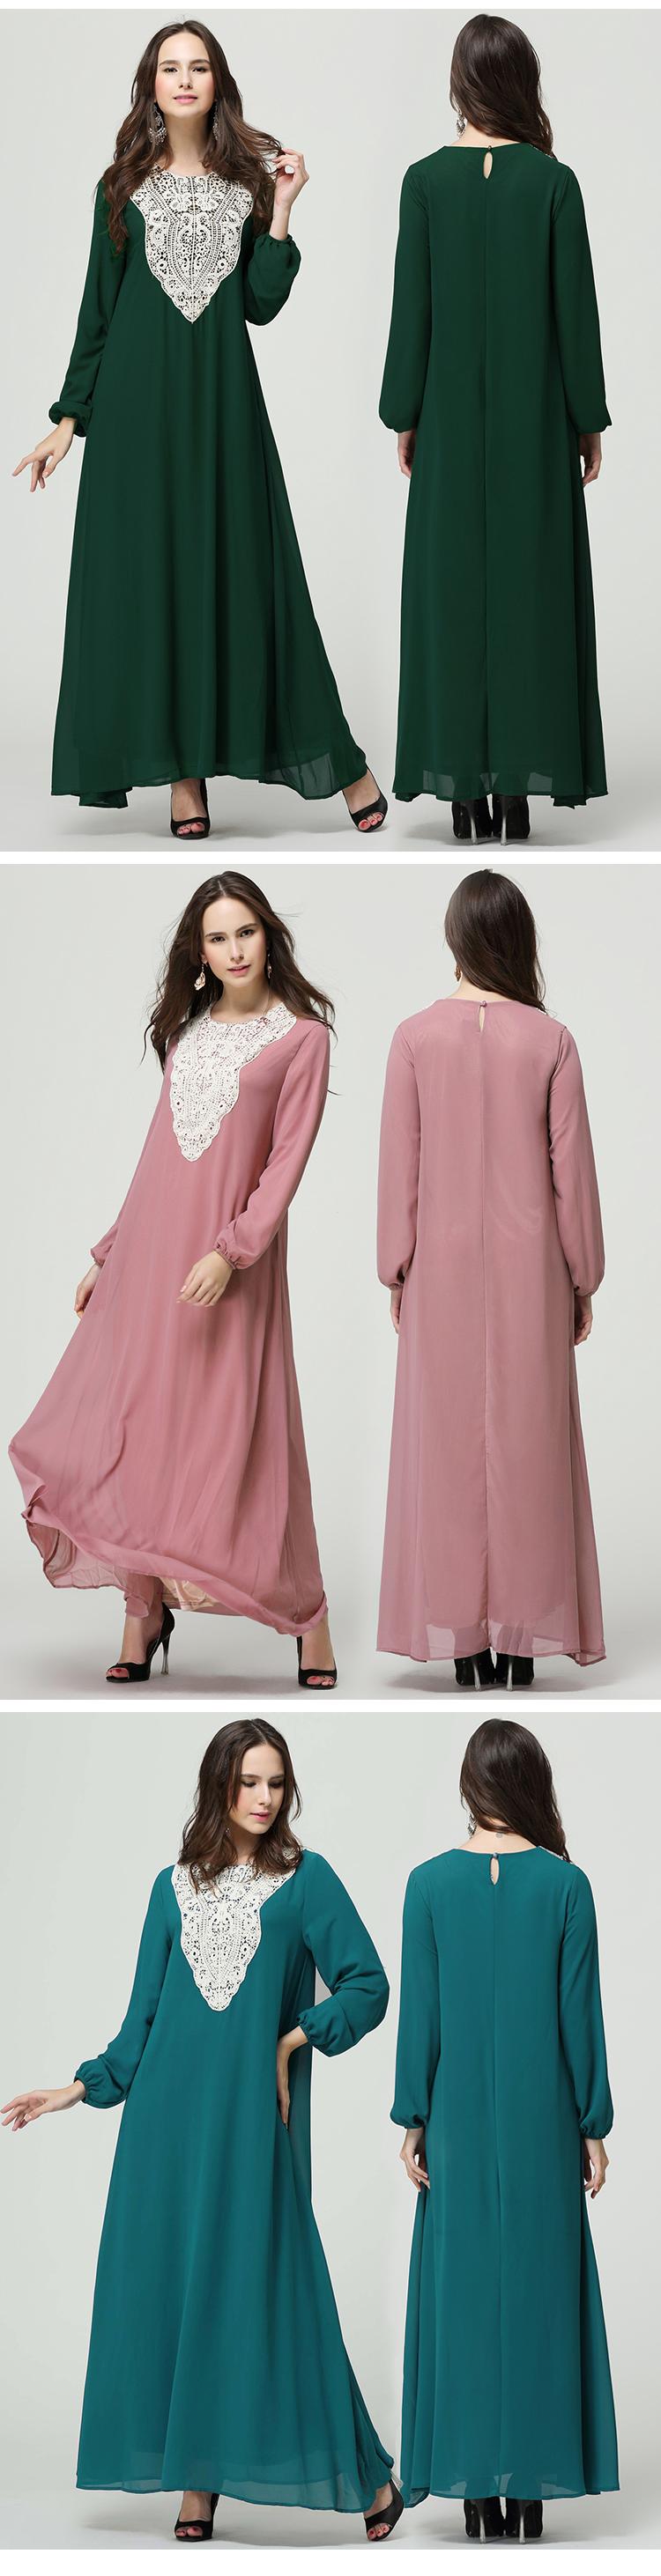 Md10009 Wholesale Muslim Islamic Plus Size Dress Long Sleeve Abaya